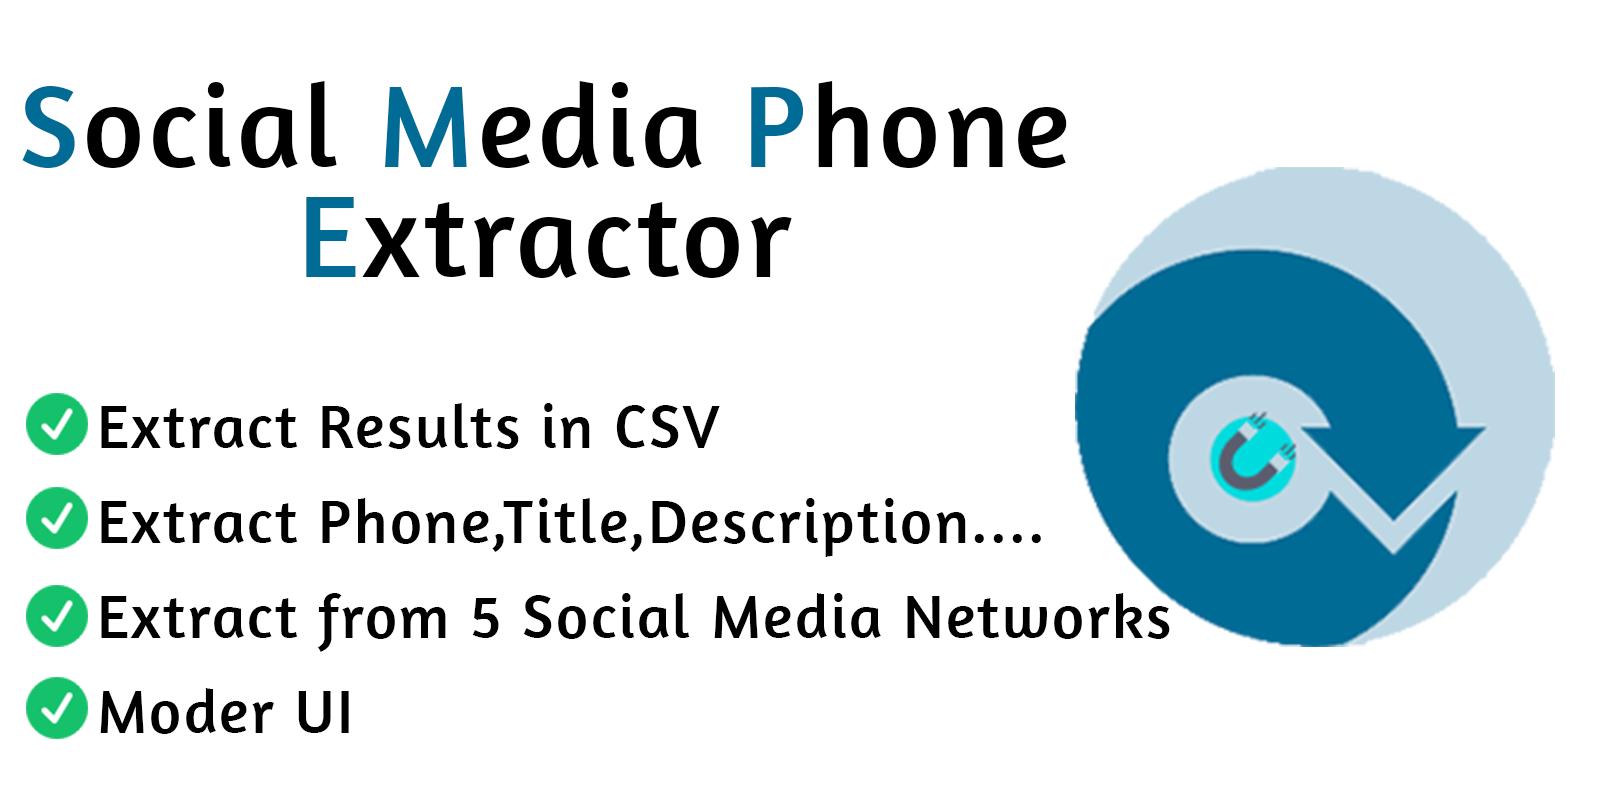 Social Media Phone Extractor Pro